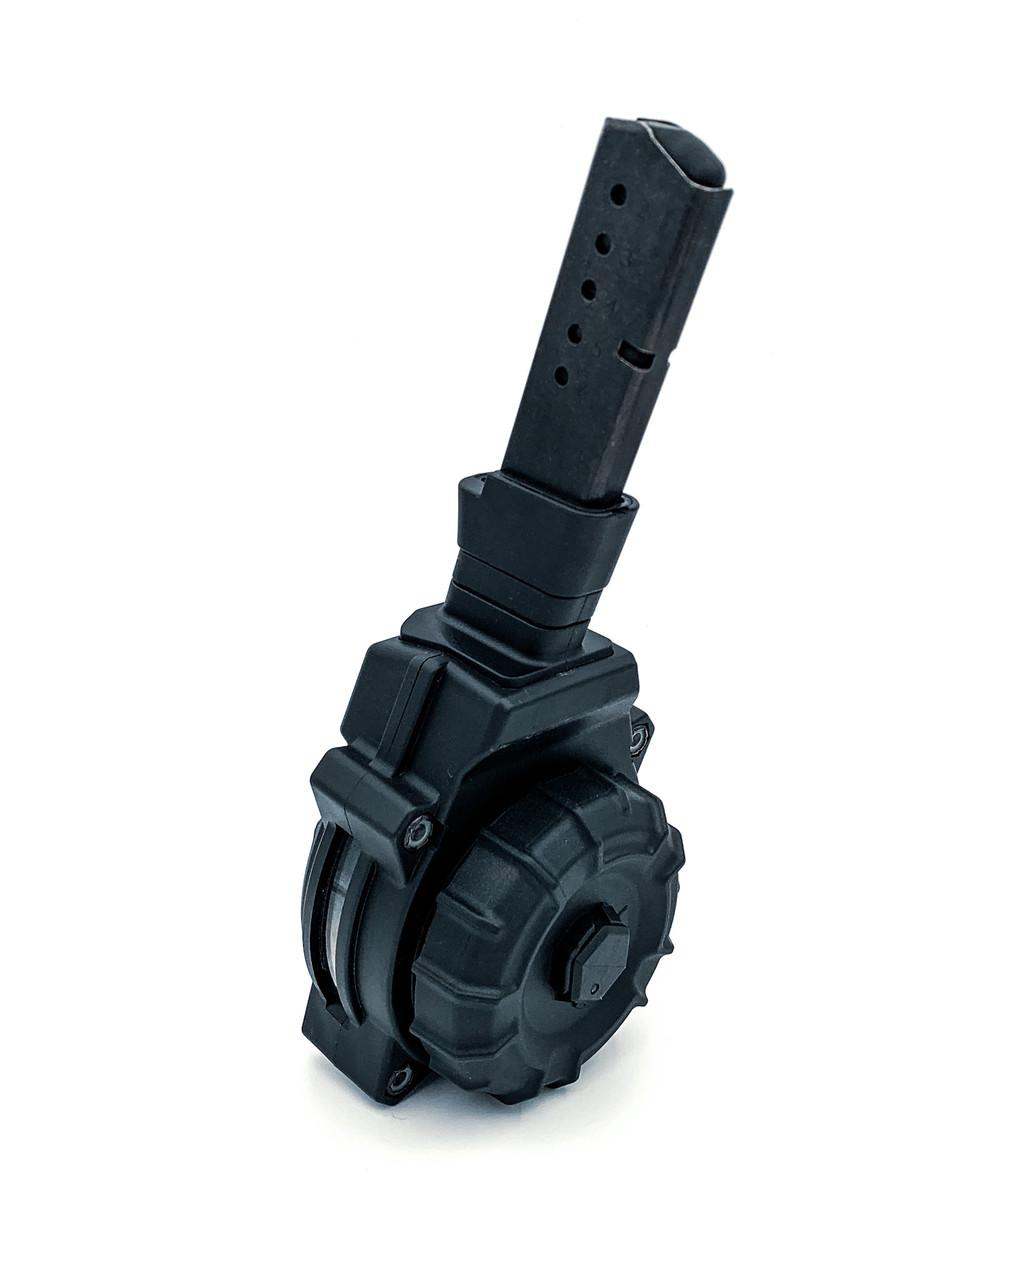 Smith & Wesson® Bodyguard® .380 ACP (32) Rd Drum - Black Polymer